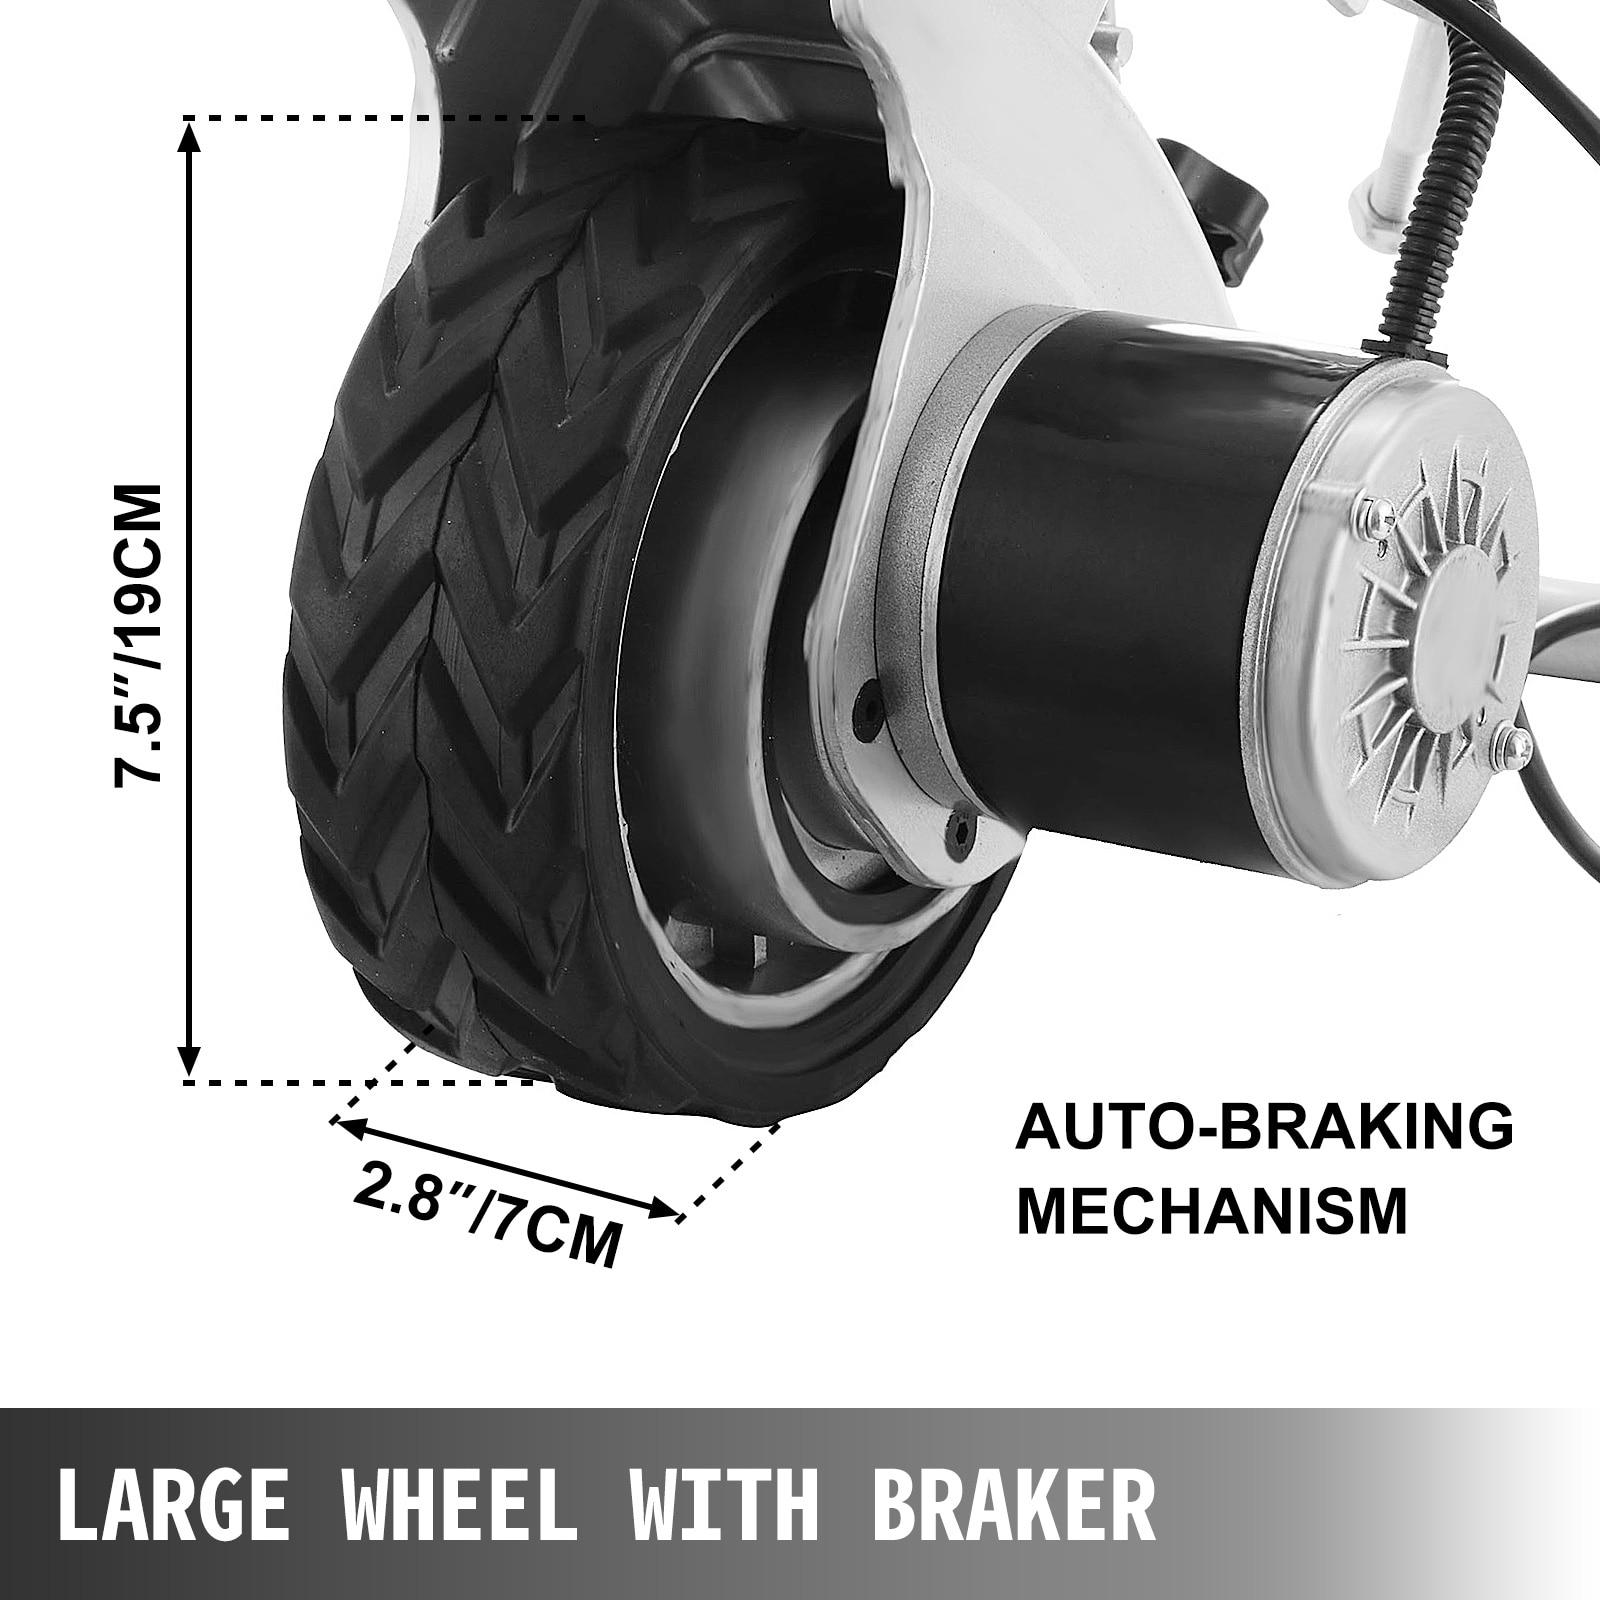 VEVOR 350W 12V Electric Motorised Jockey Wheel 2270KG Vehicle Load Caravan Boat Wheel Dolly Utility Trailer Pickup Power Mover enlarge